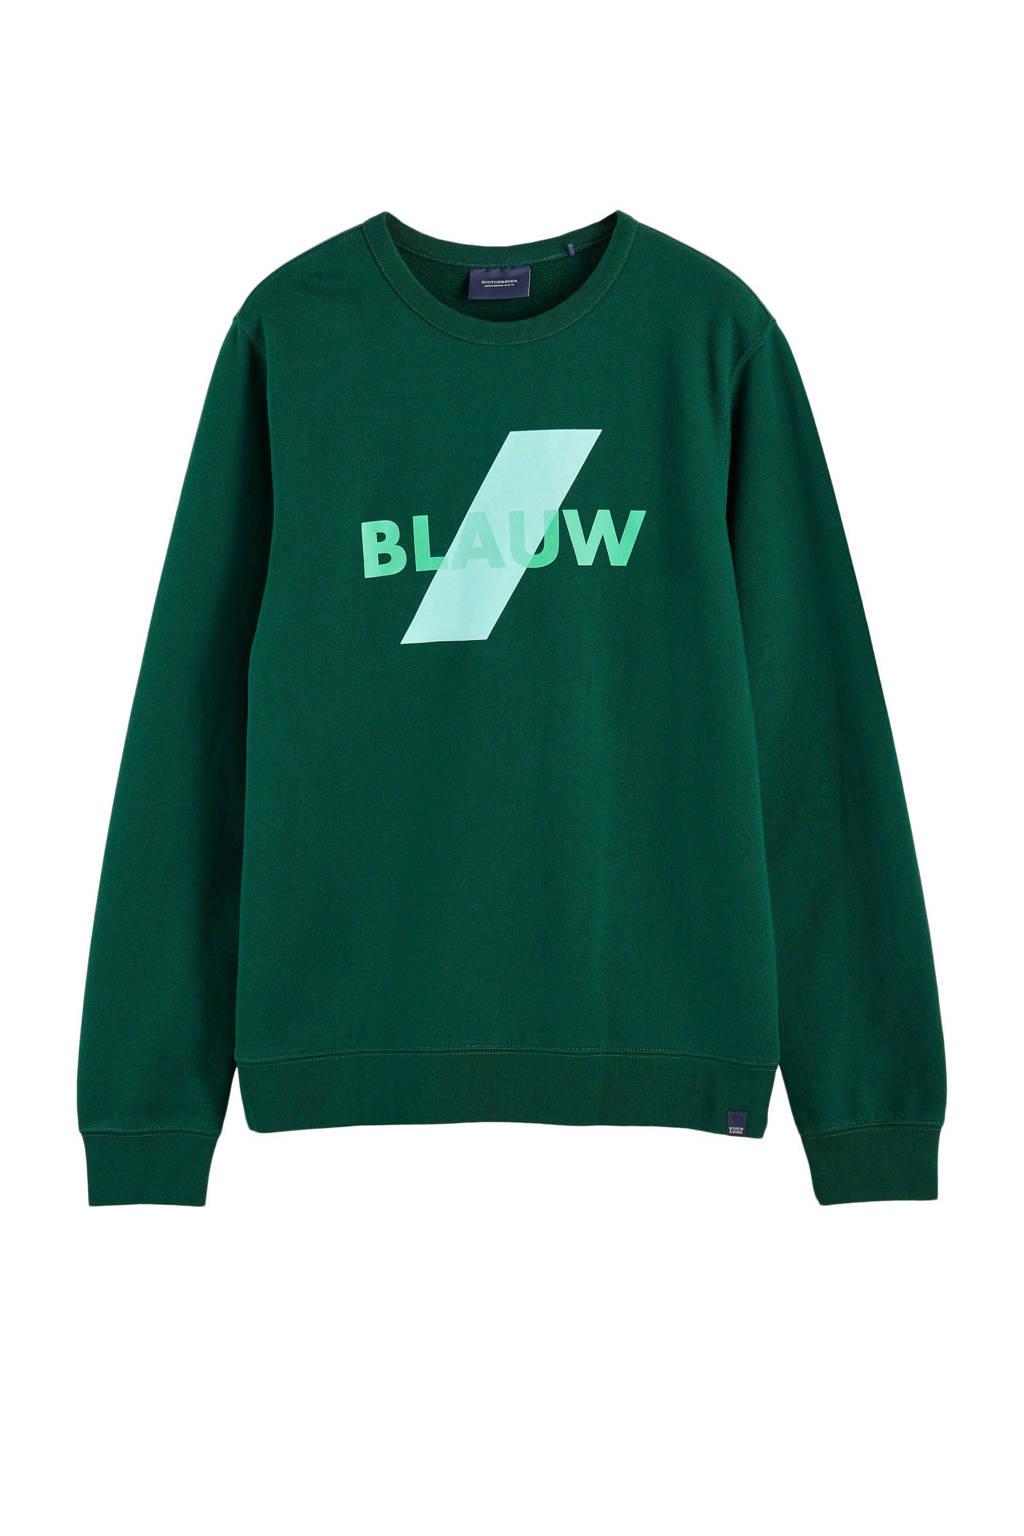 Scotch & Soda Amsterdams Blauw sweater met printopdruk groen, Groen